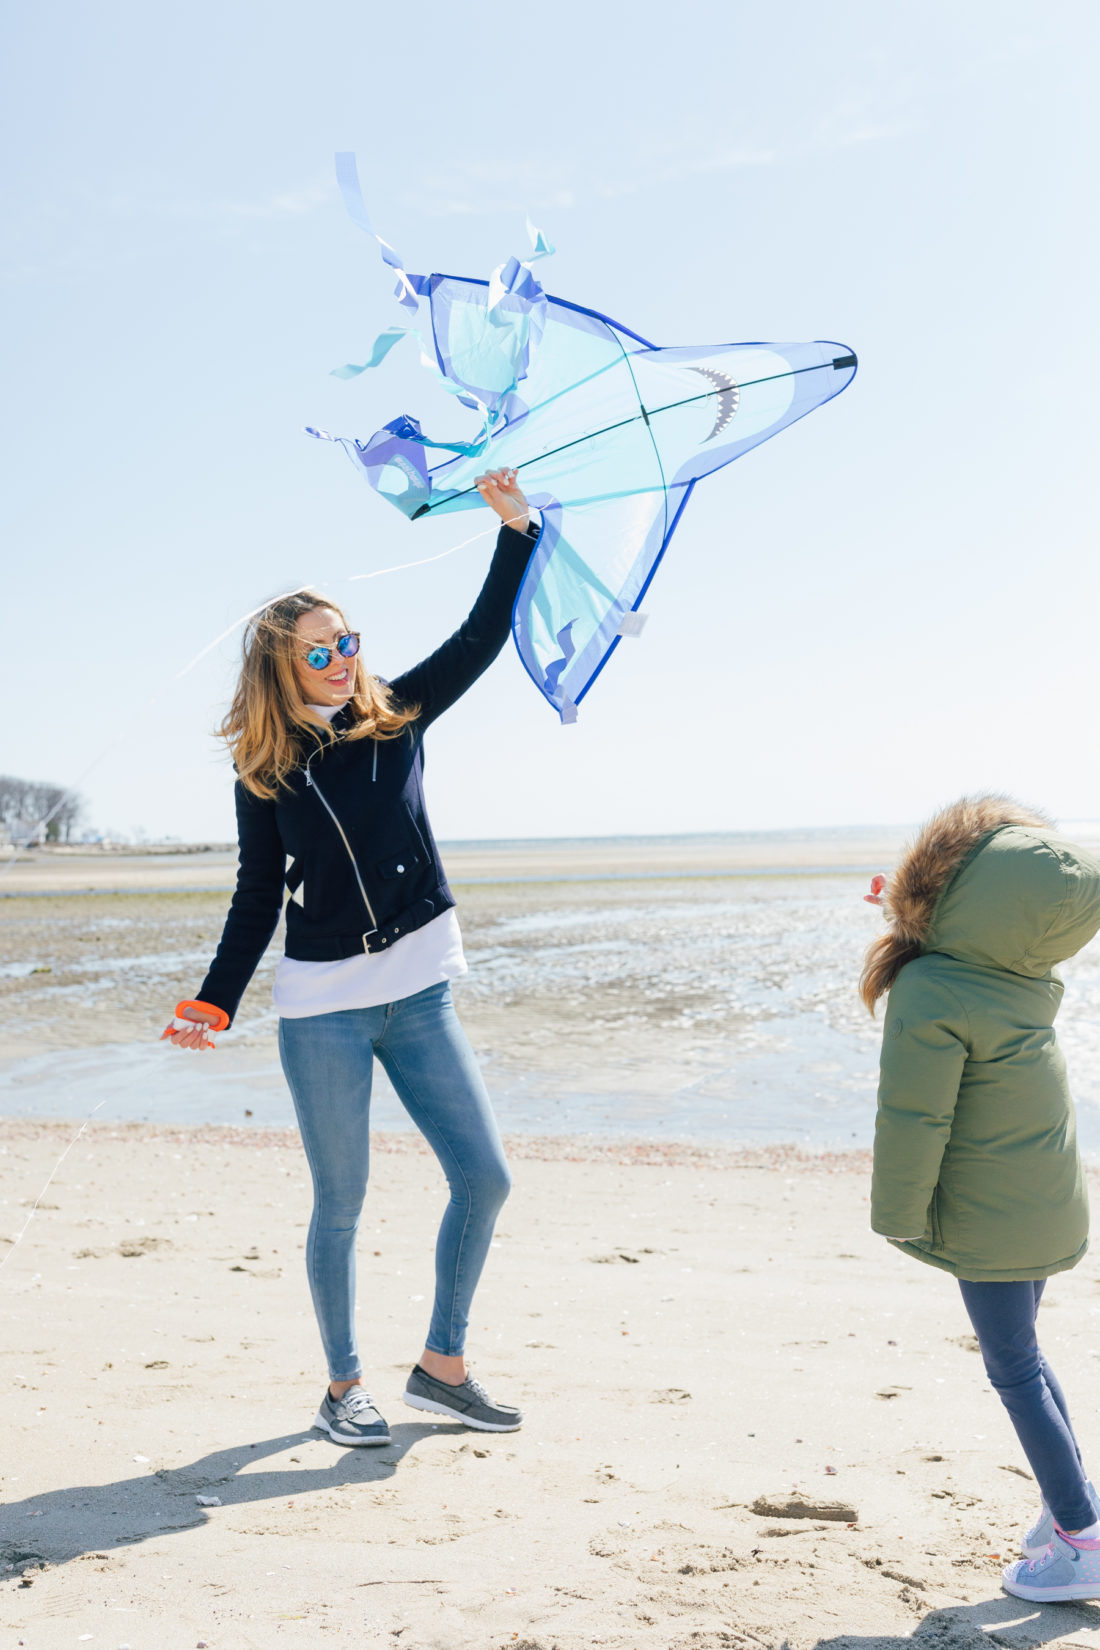 Eva Amurri Martino of Happily Eva After wears Sketchers GoWalk Lite Isla Boat Shoe while flying a kite on the beach